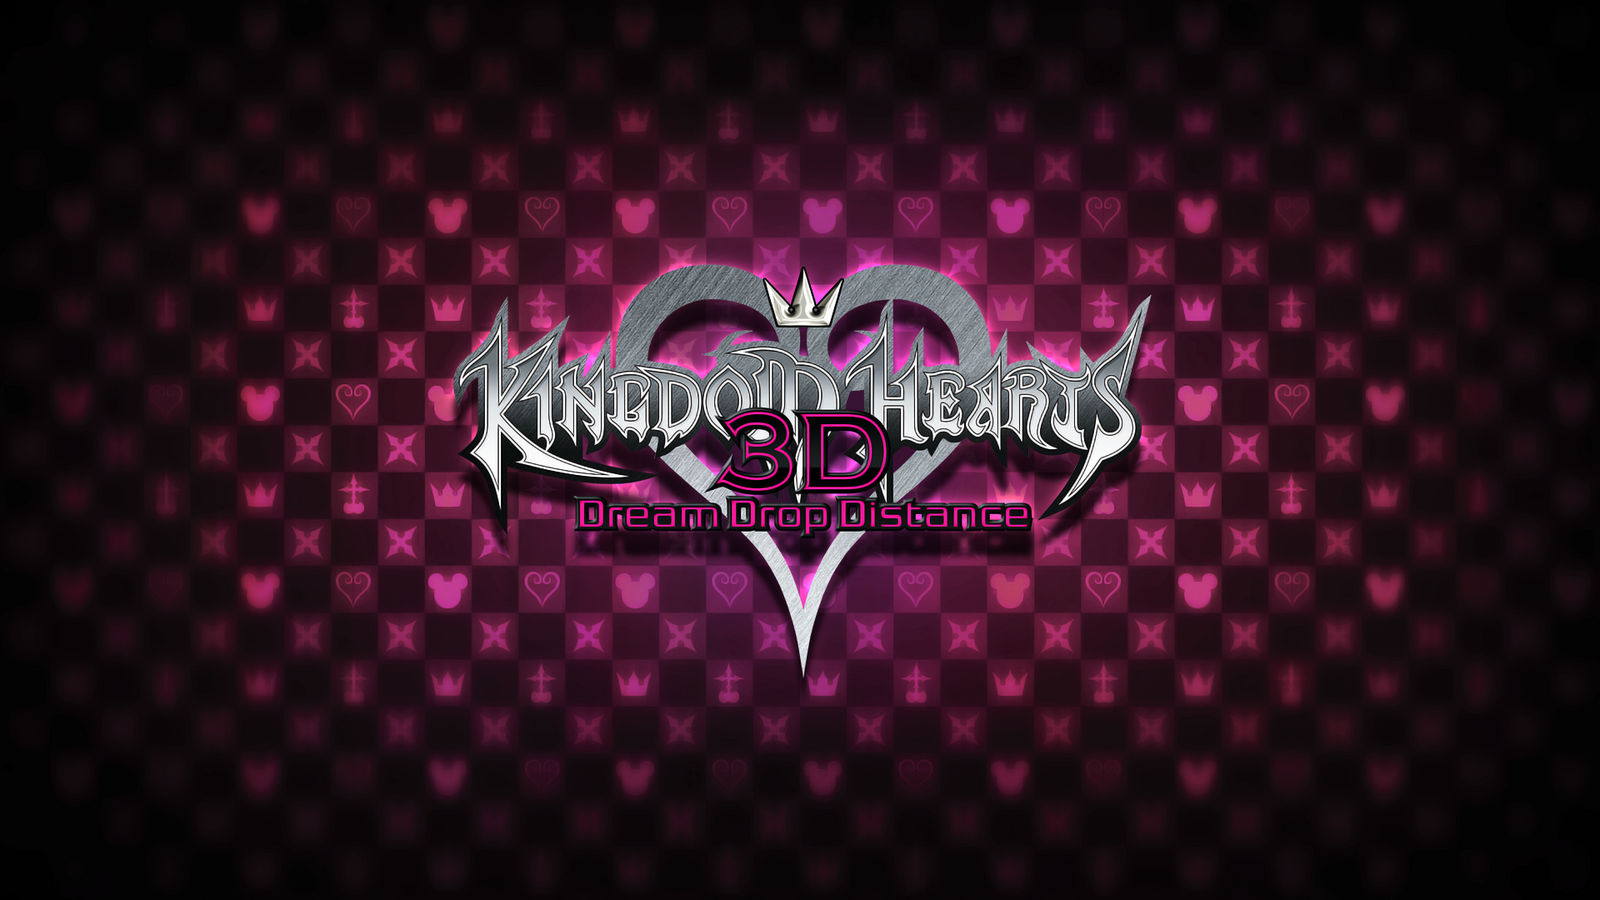 Kingdom Hearts 3d Dream Drop Distance Wallpaper By